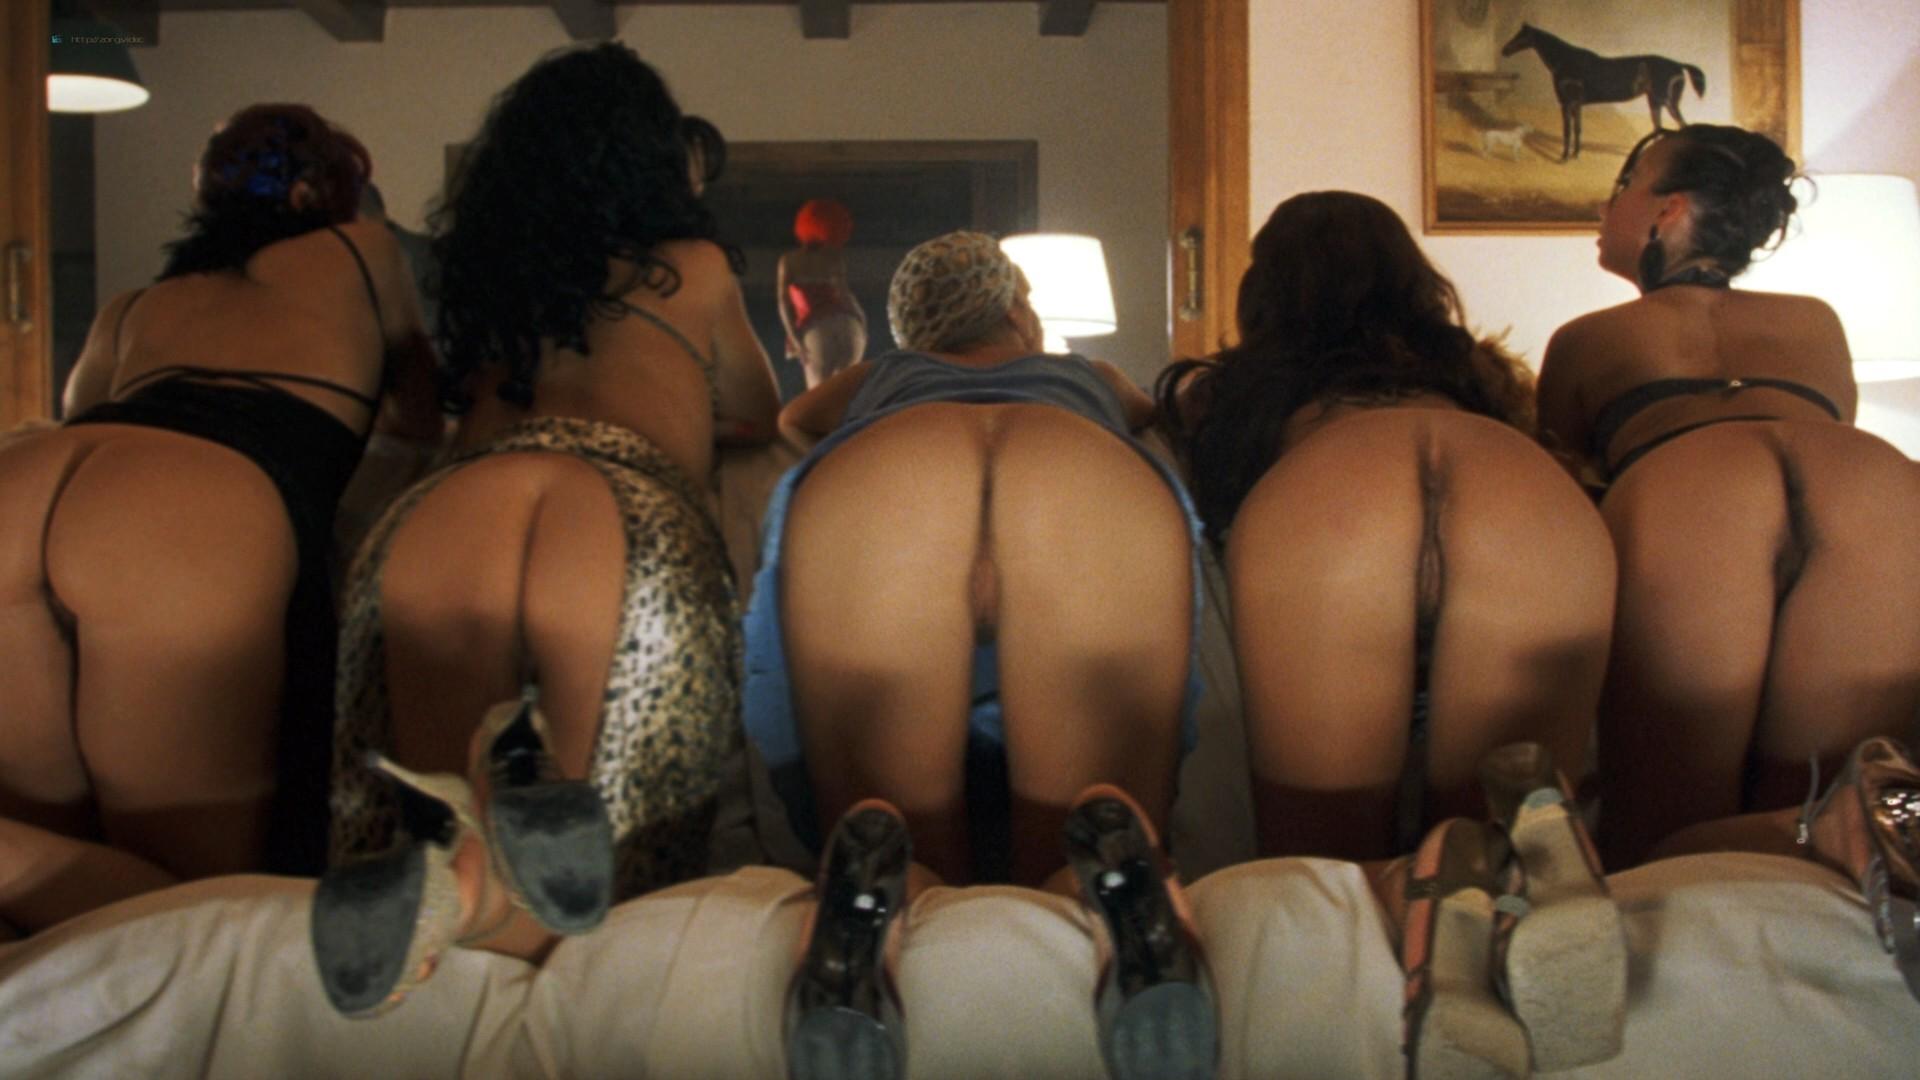 Yuliya Mayarchuk nude sex explicit Francesca Nunzi, Leila Carli all nude - Trasgredire (2000) HD 1080p BluRay (12)